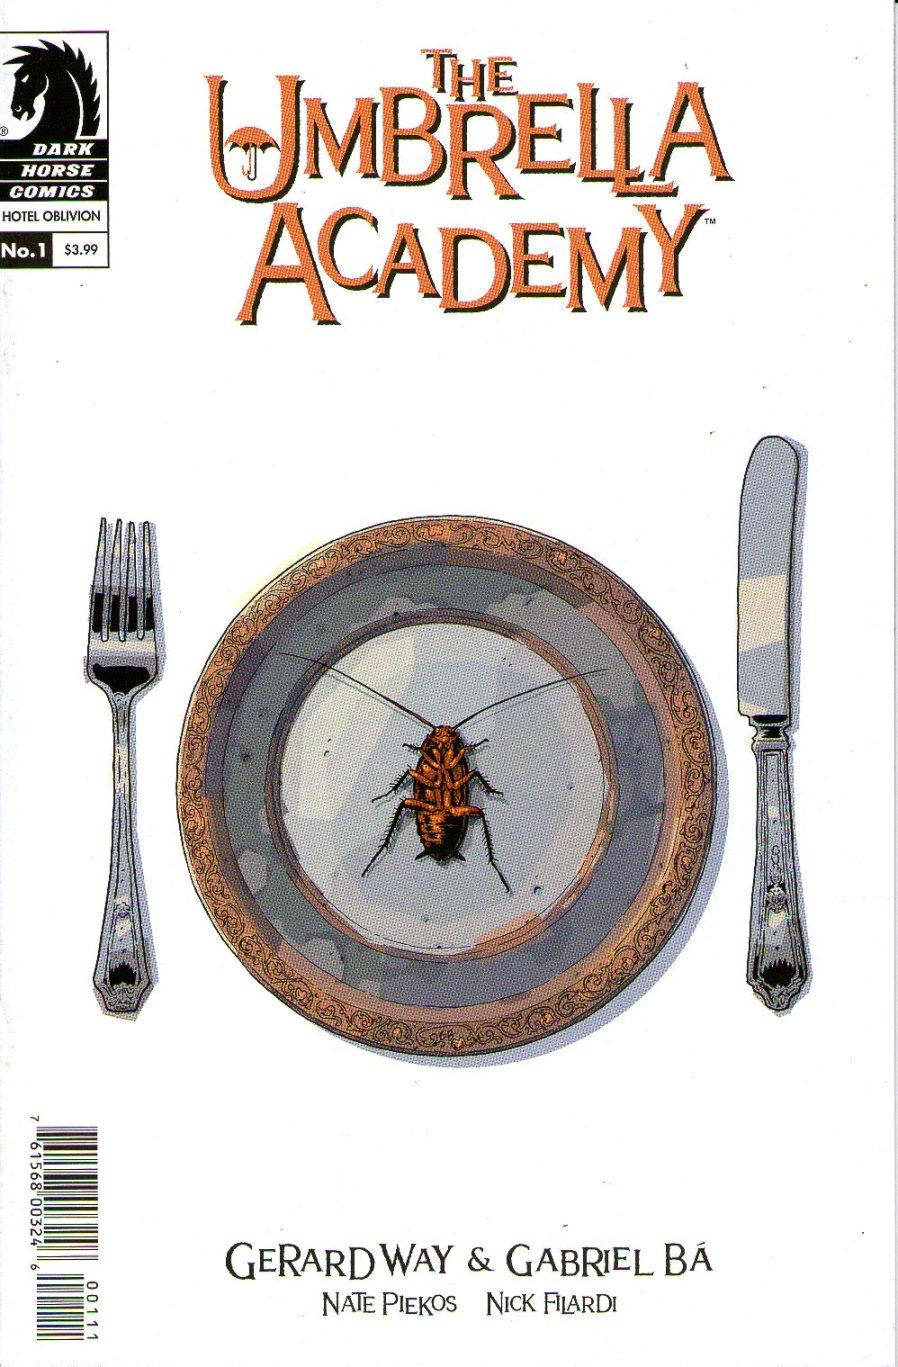 Lucky_Target_Comics_Dark_Horse_Umbrella_Academy_Hotel_Oblivion_1586.jpg